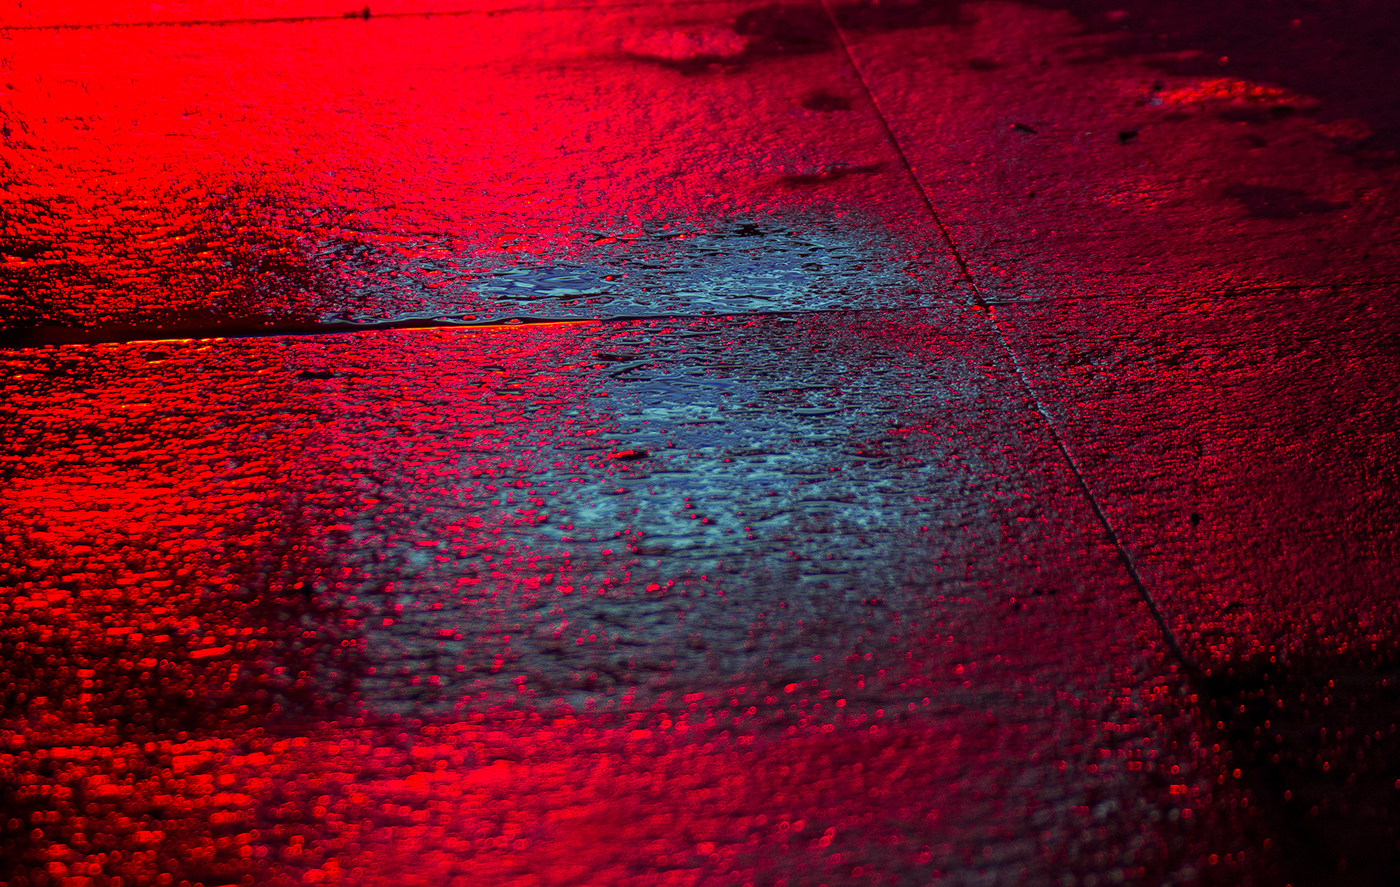 wet-neon-local-preacher-photography-5.jpg